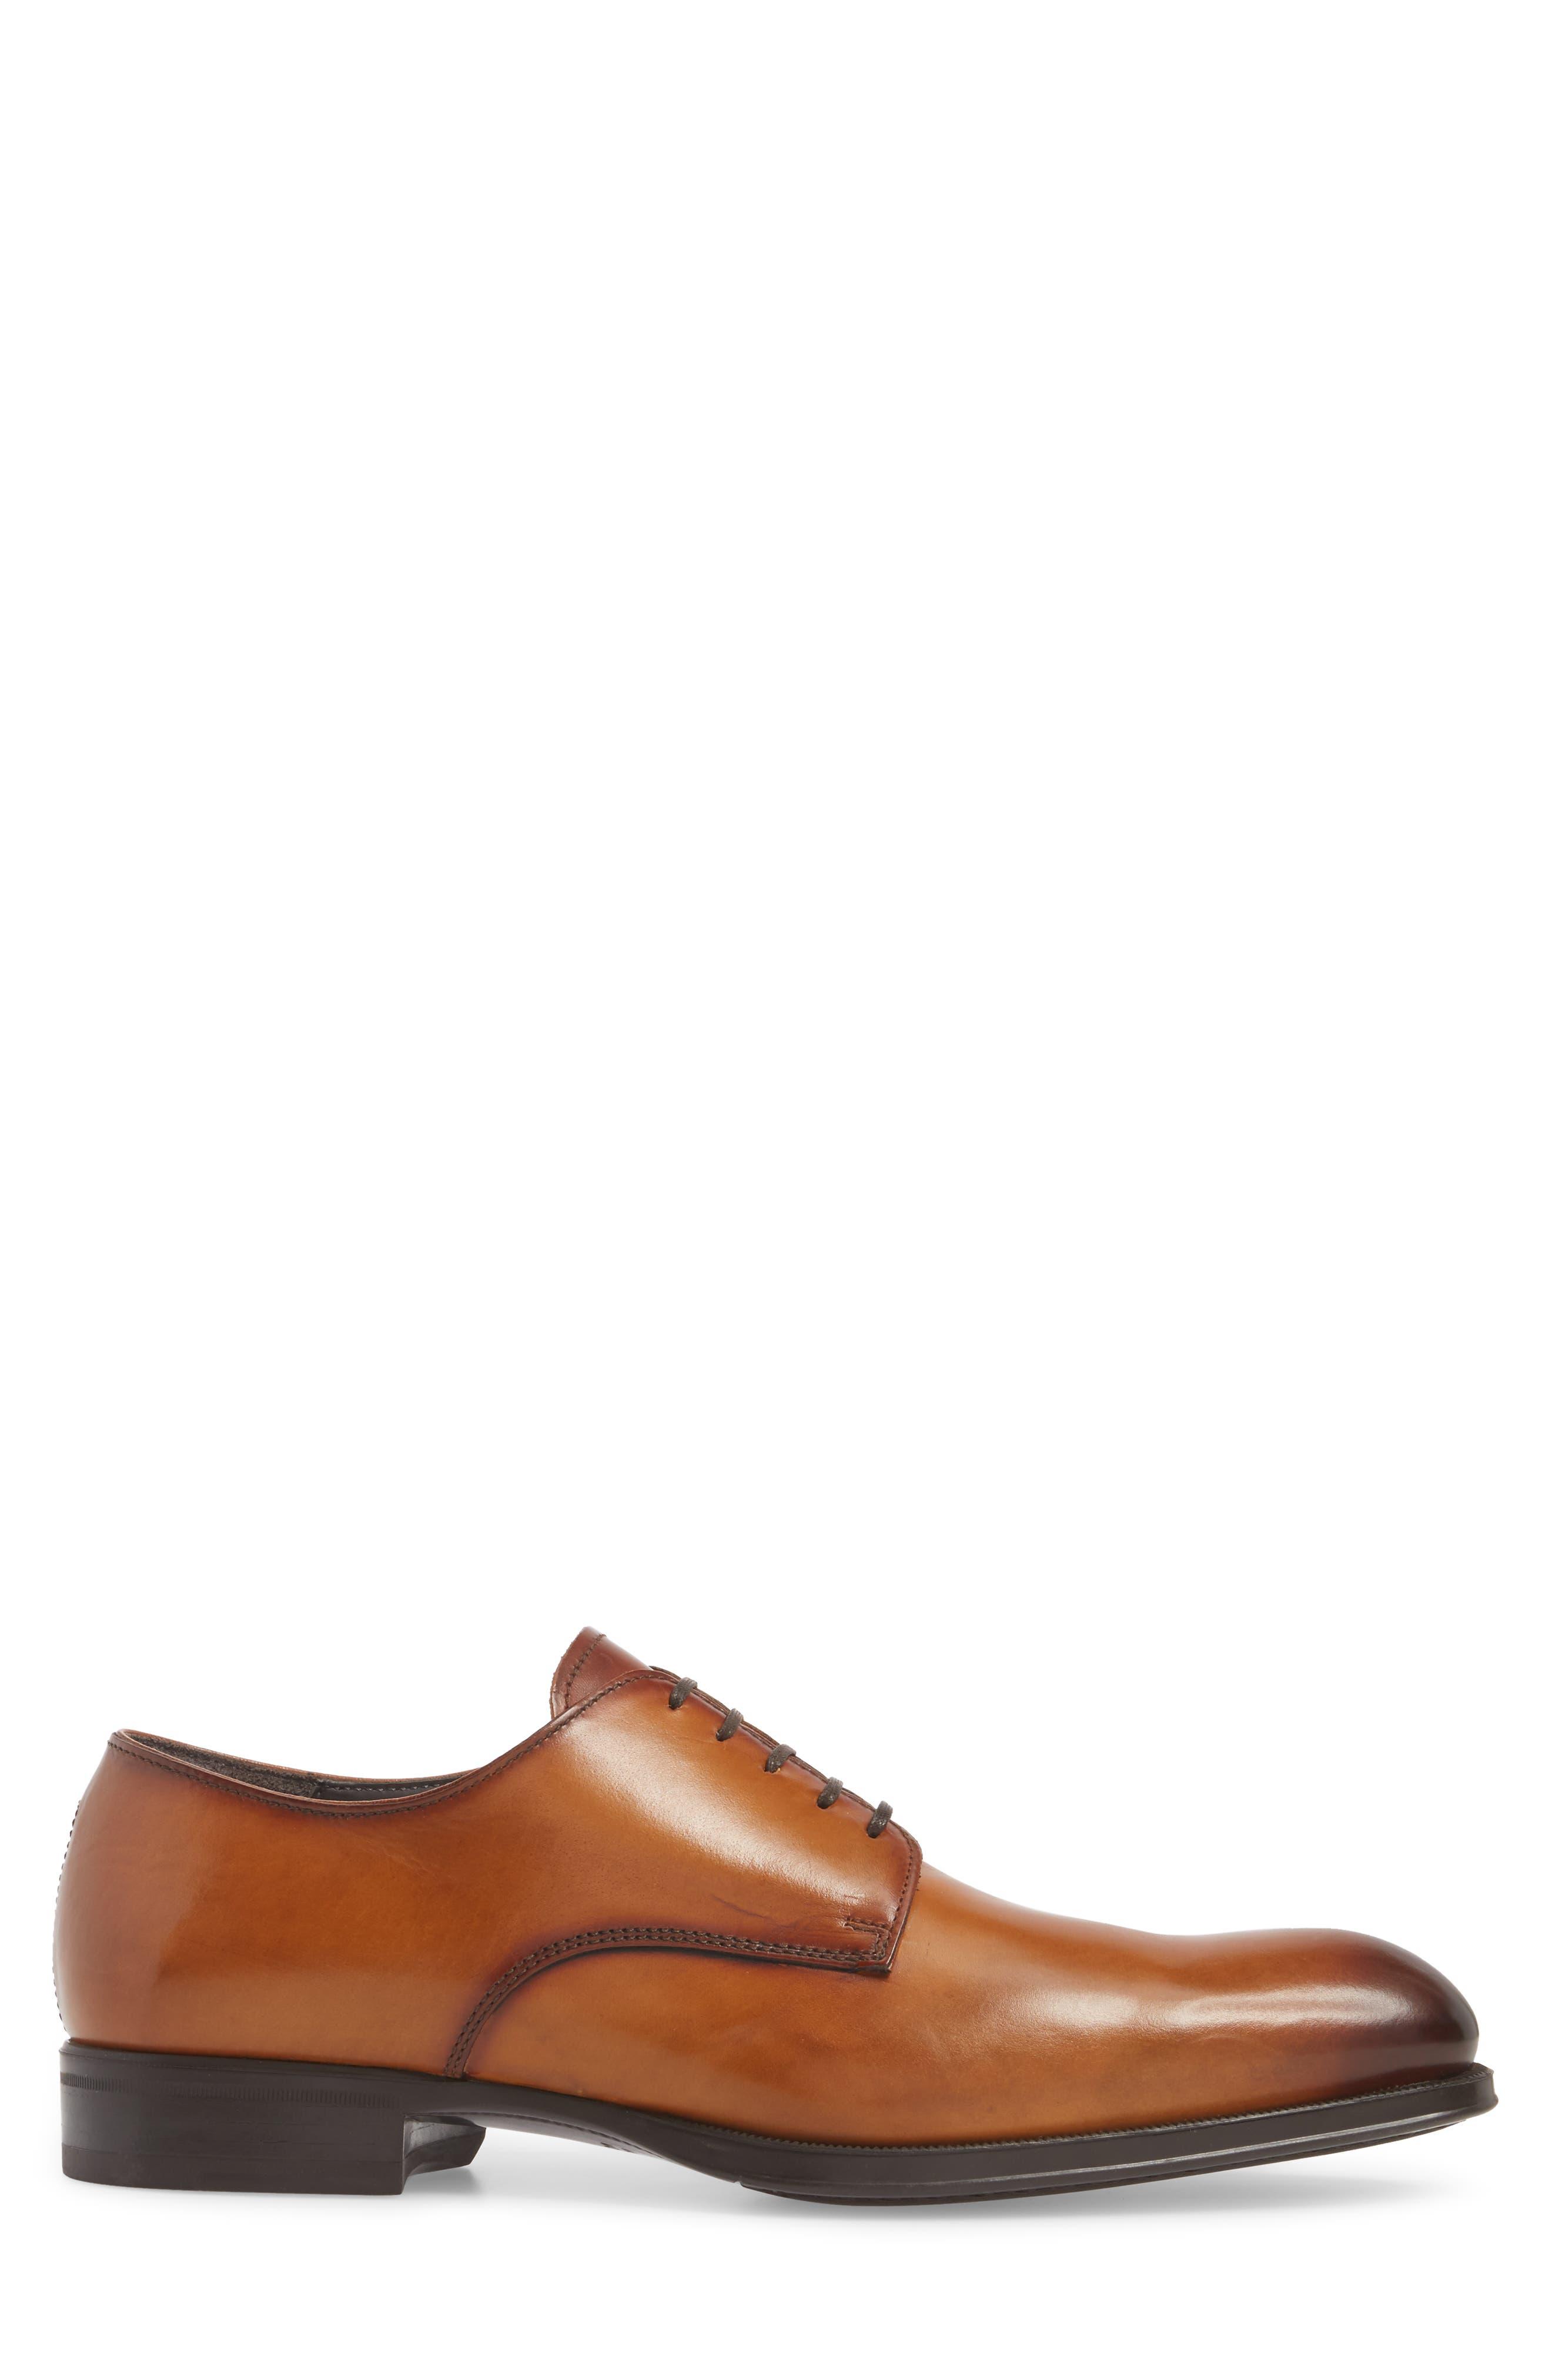 'Buchanan' Plain Toe Derby,                             Alternate thumbnail 3, color,                             245